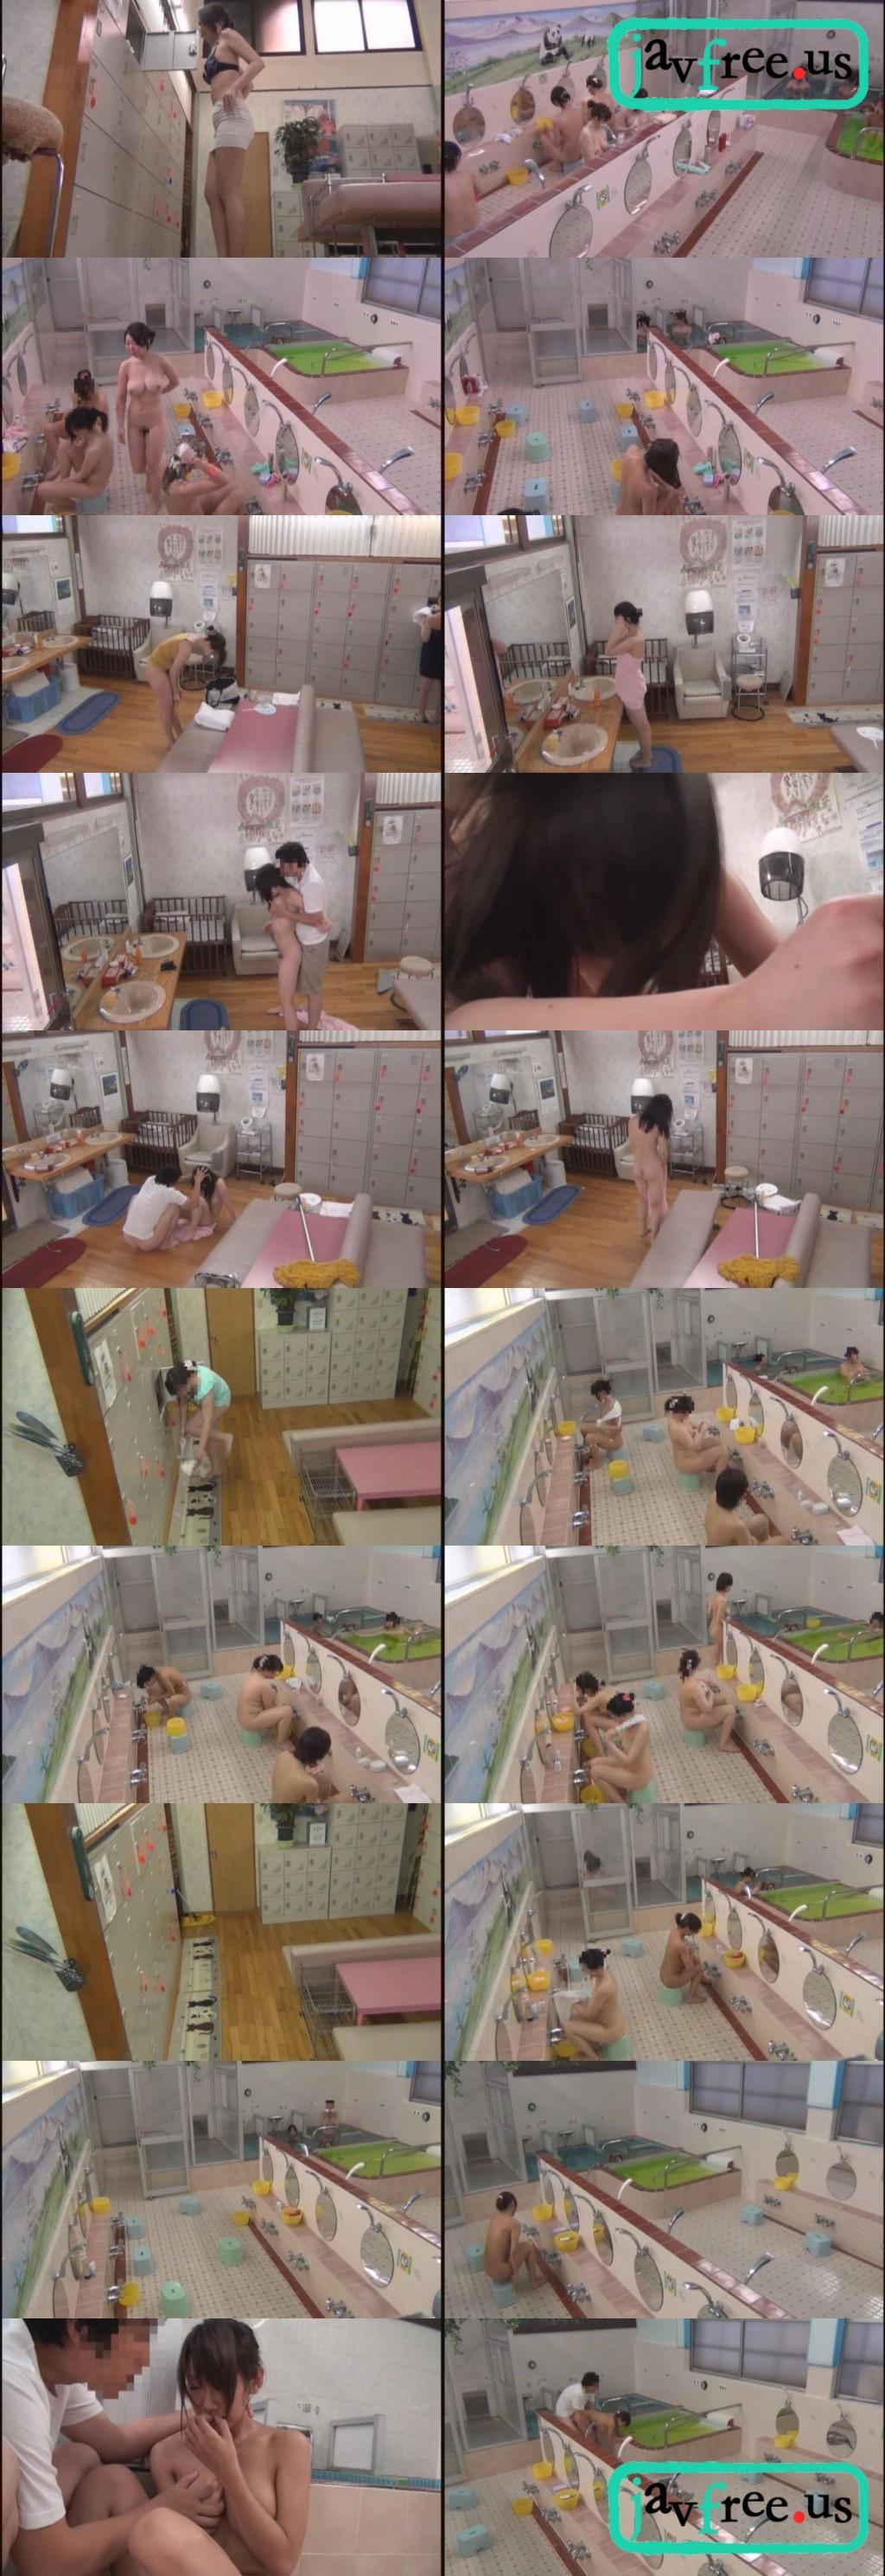 [AOZ 081] 番台による銭湯レイプ盗撮映像 AOZ